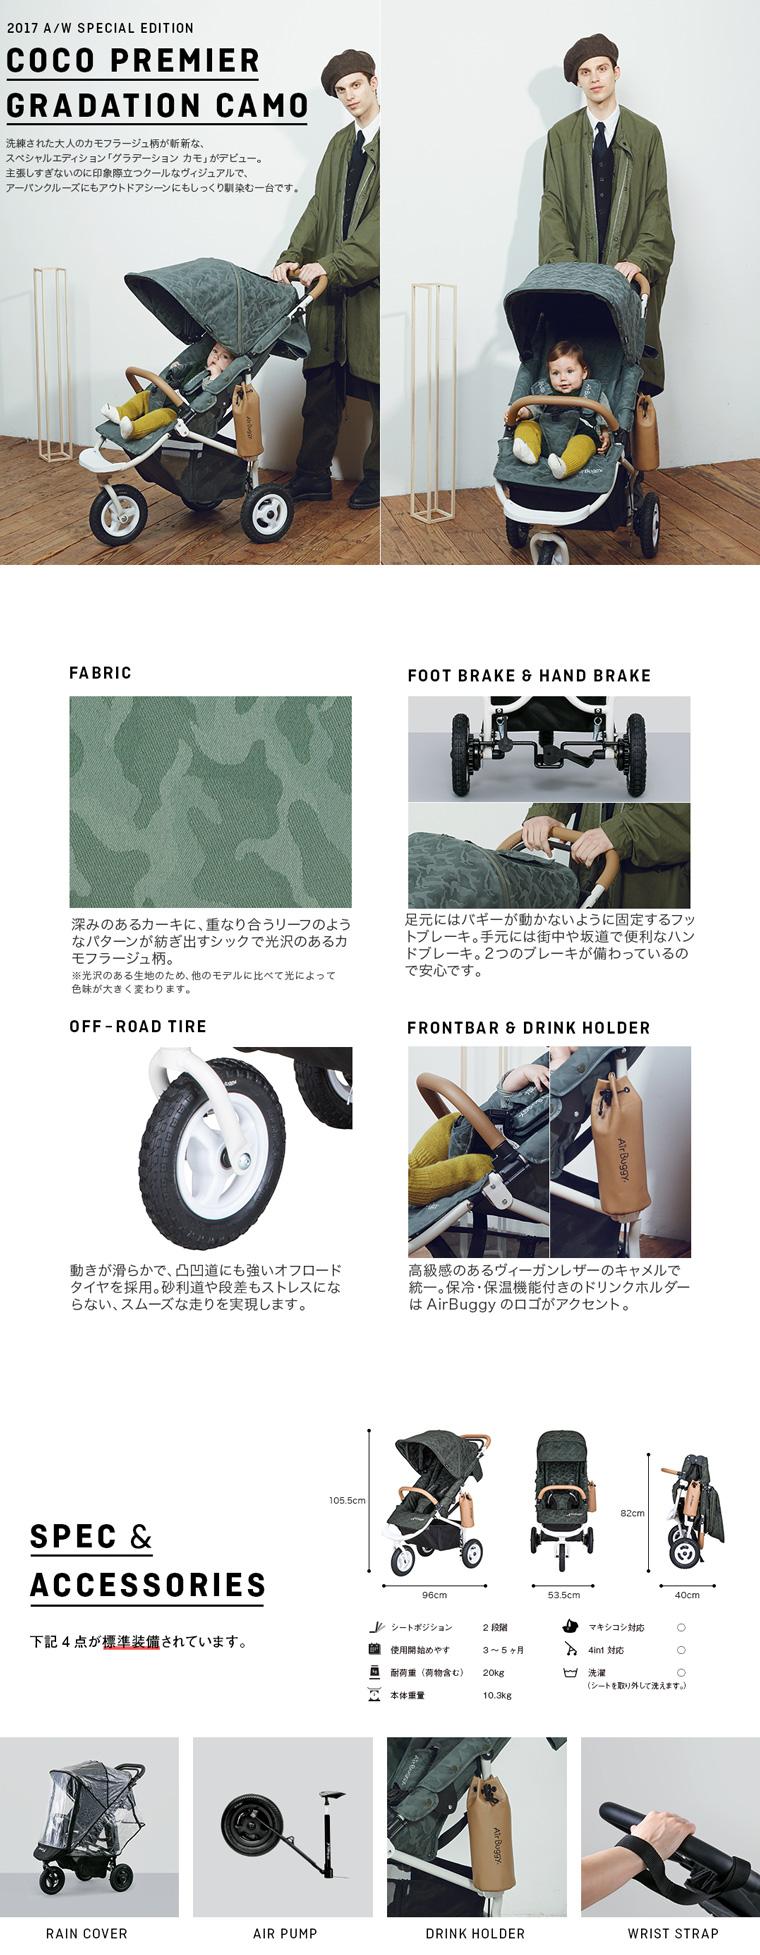 airbuggy-coco-premier-gradationcamo-info01